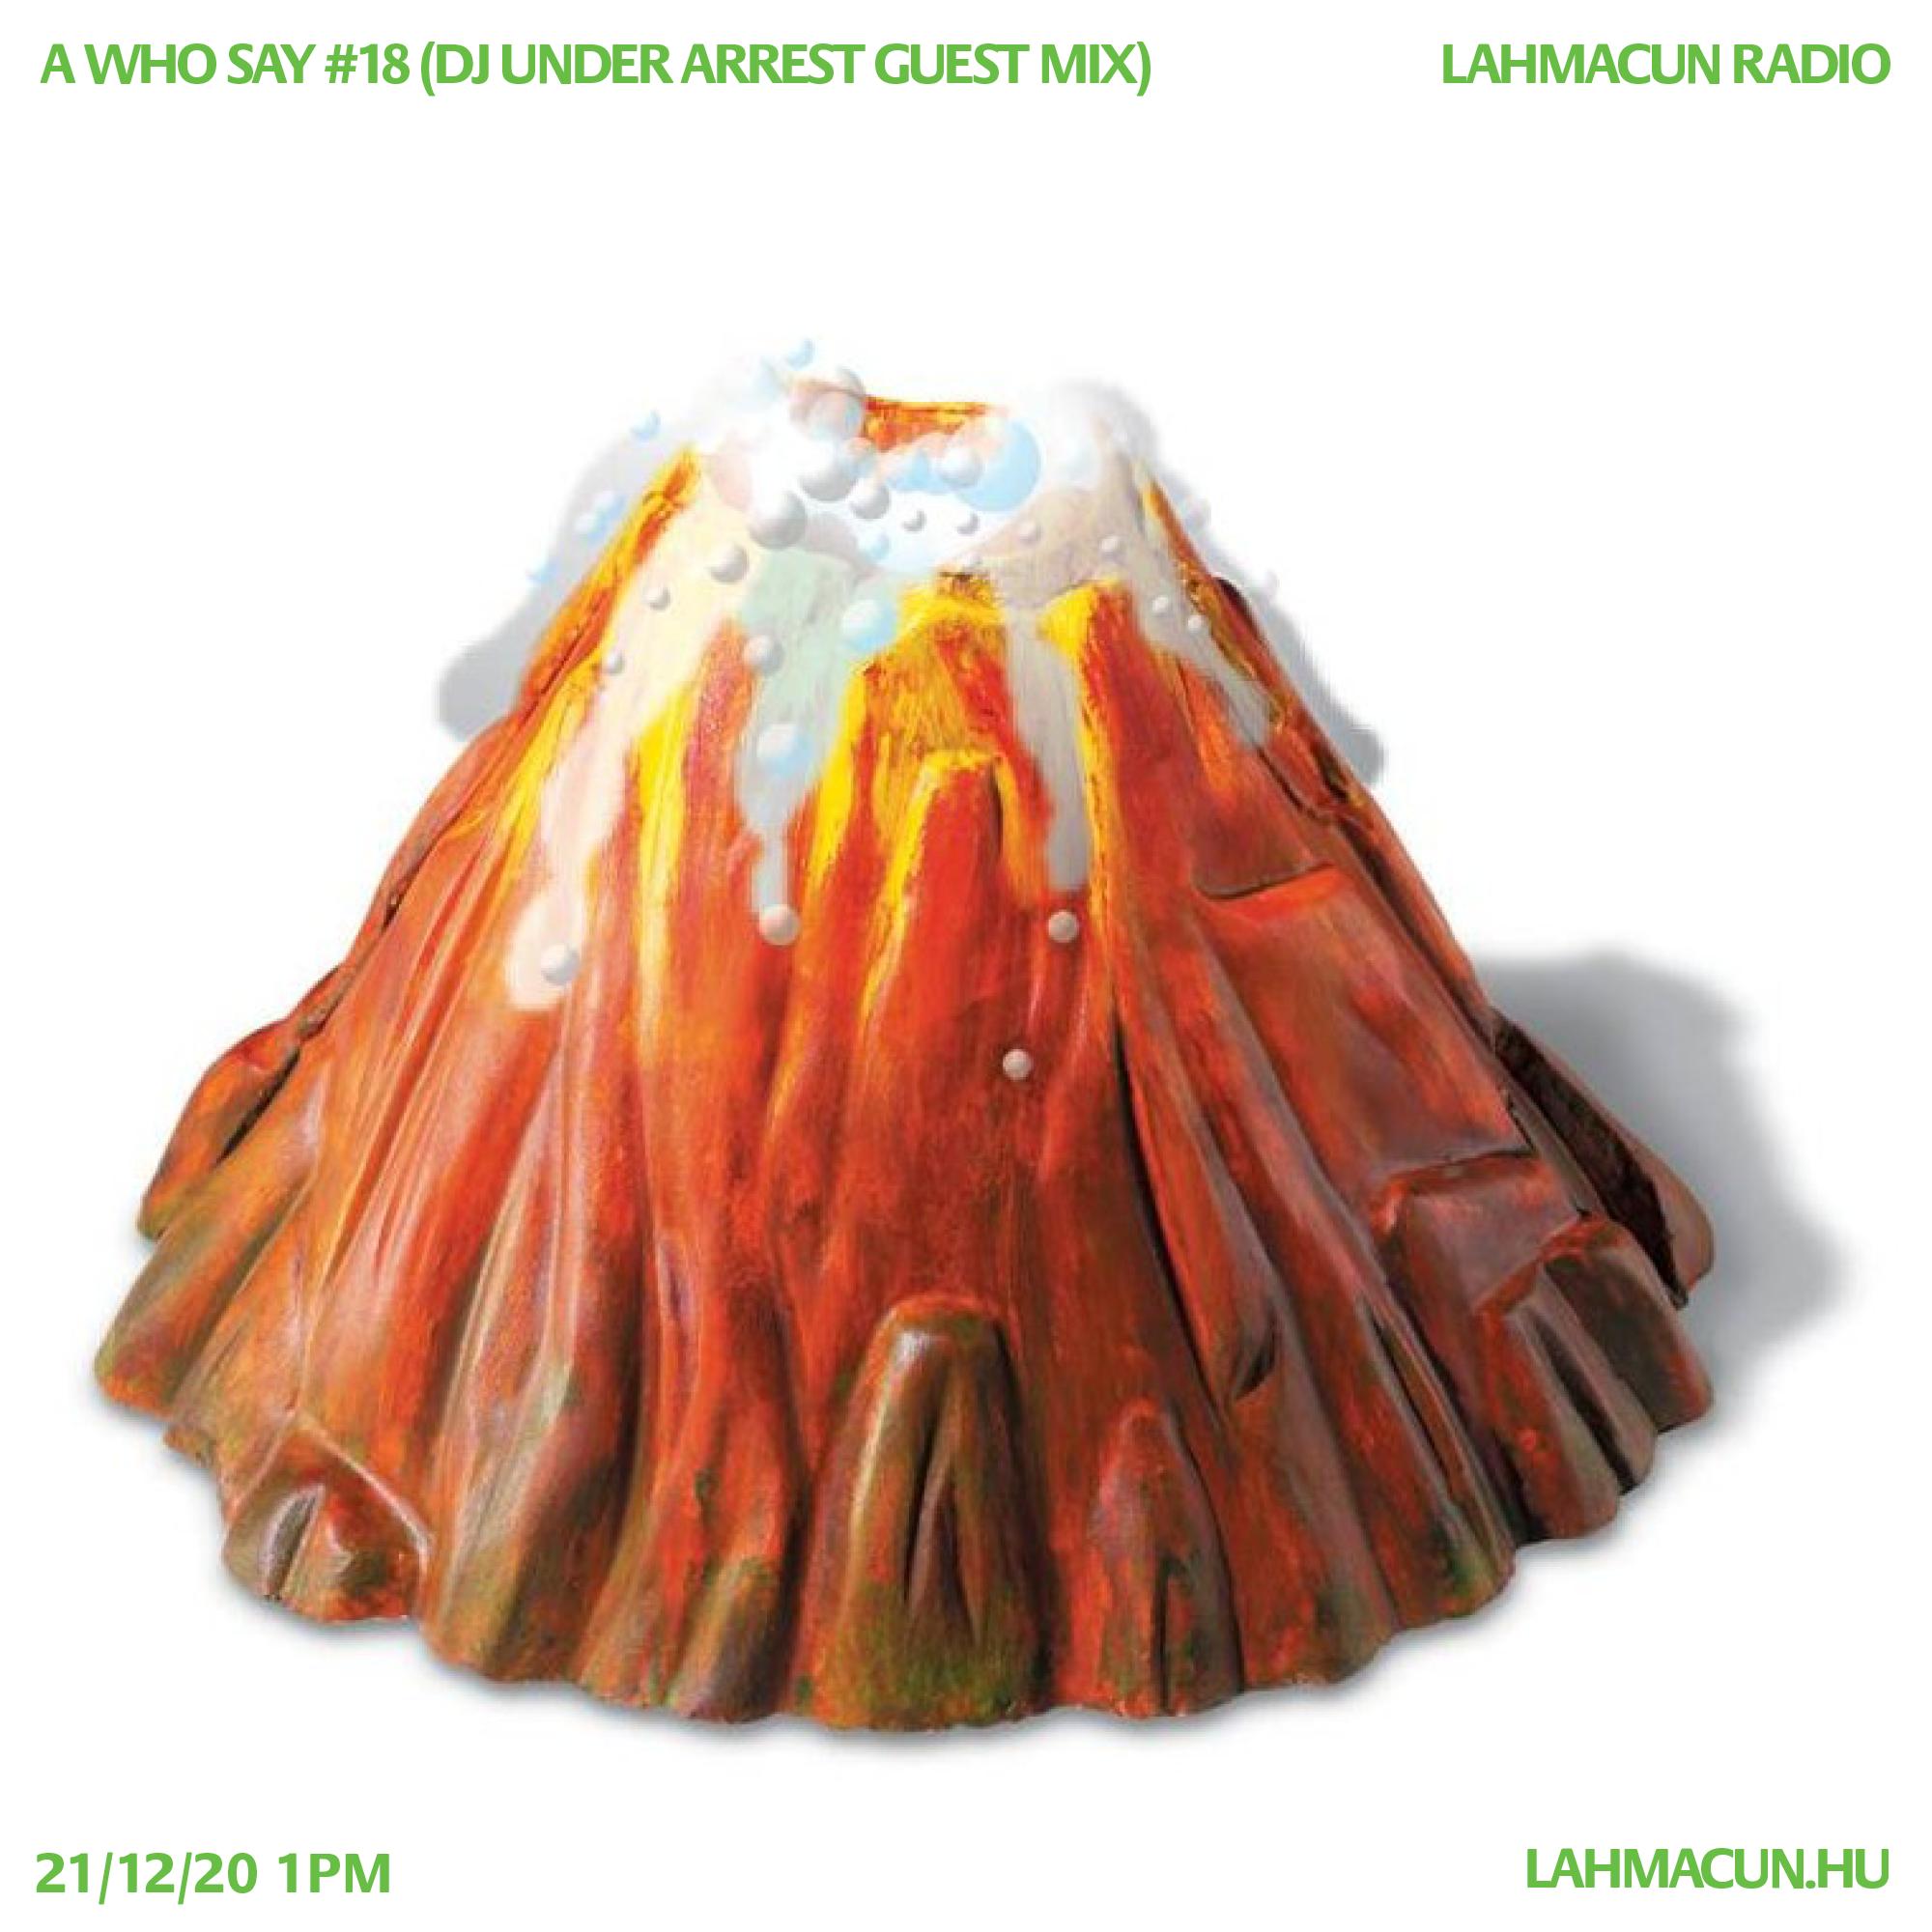 #18 (DJ Under Arrest Guest Mix)